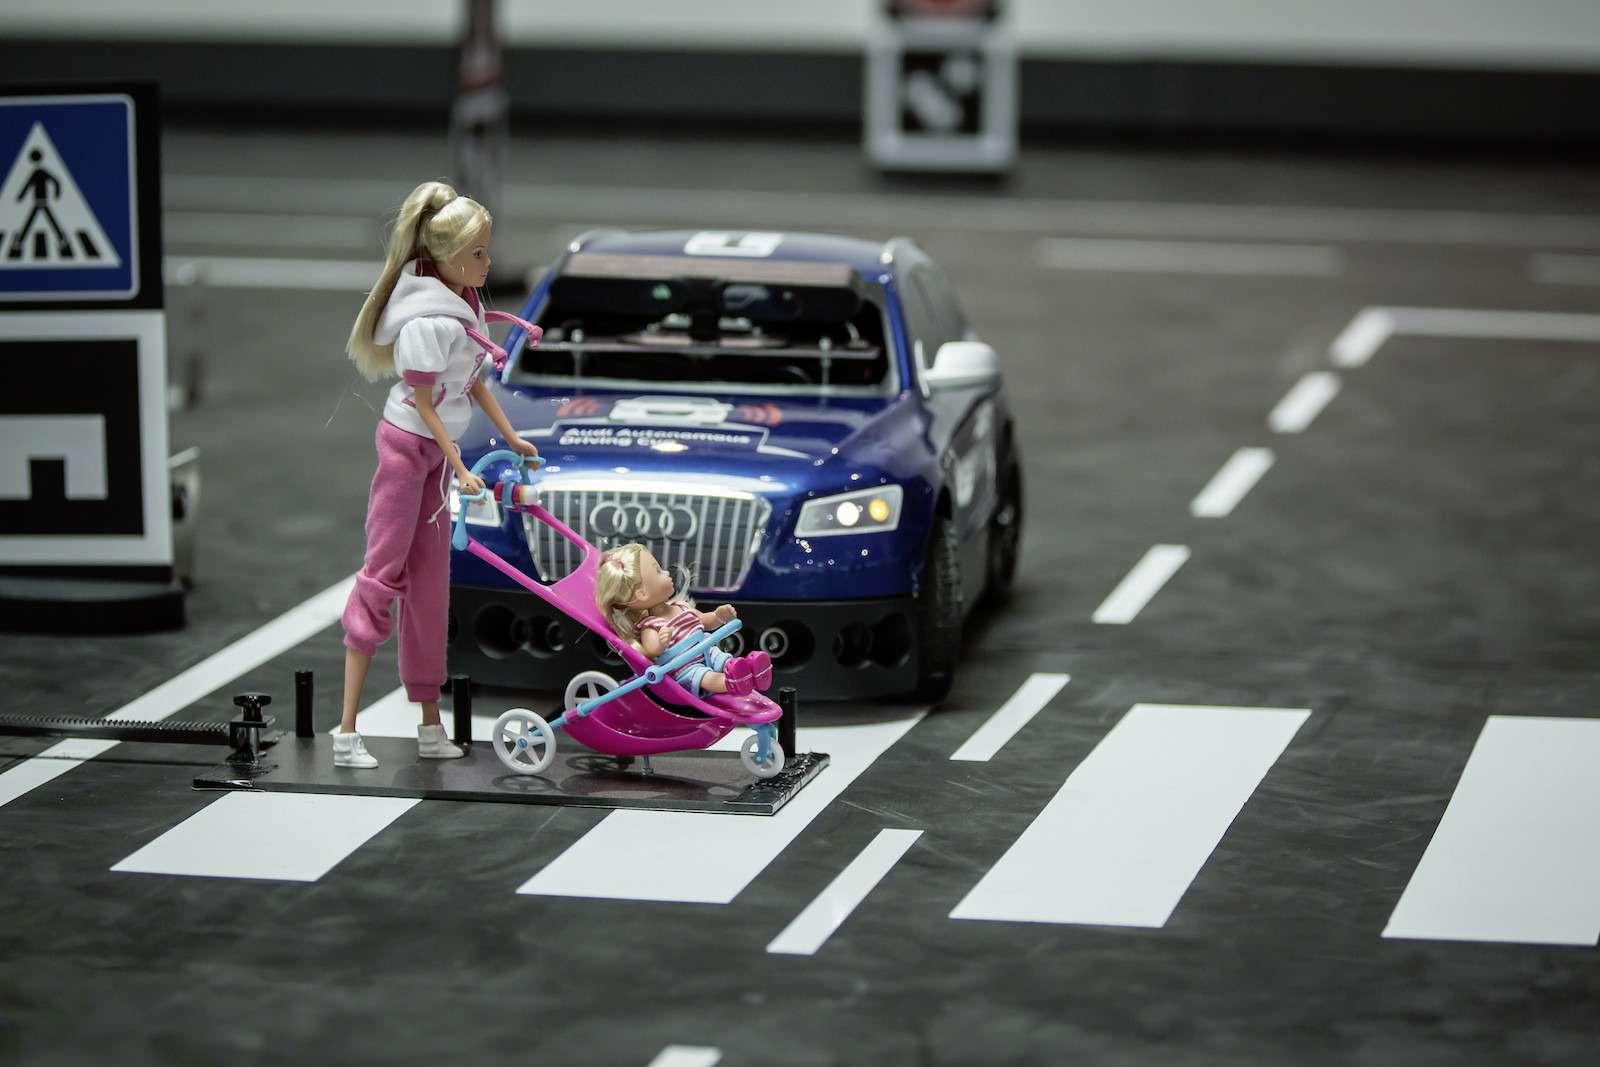 Роботы вместо футболистов, или Как водителей оставят без руля— фото 574759